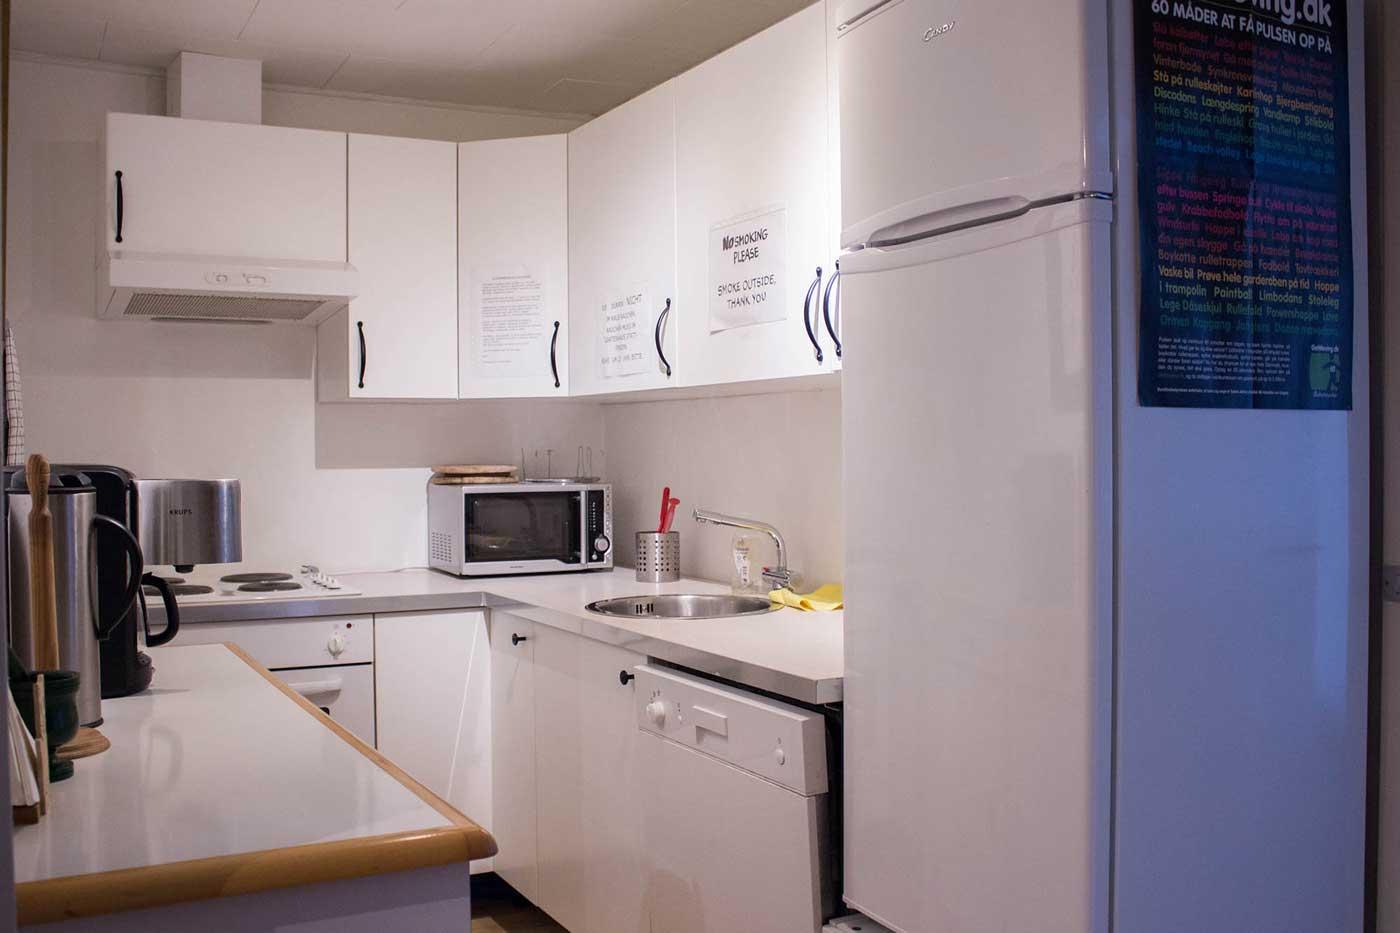 Køkkenet med kølefryseskab, mikroovn, elkedel, kaffemaskine, opvaskemaskine mv.